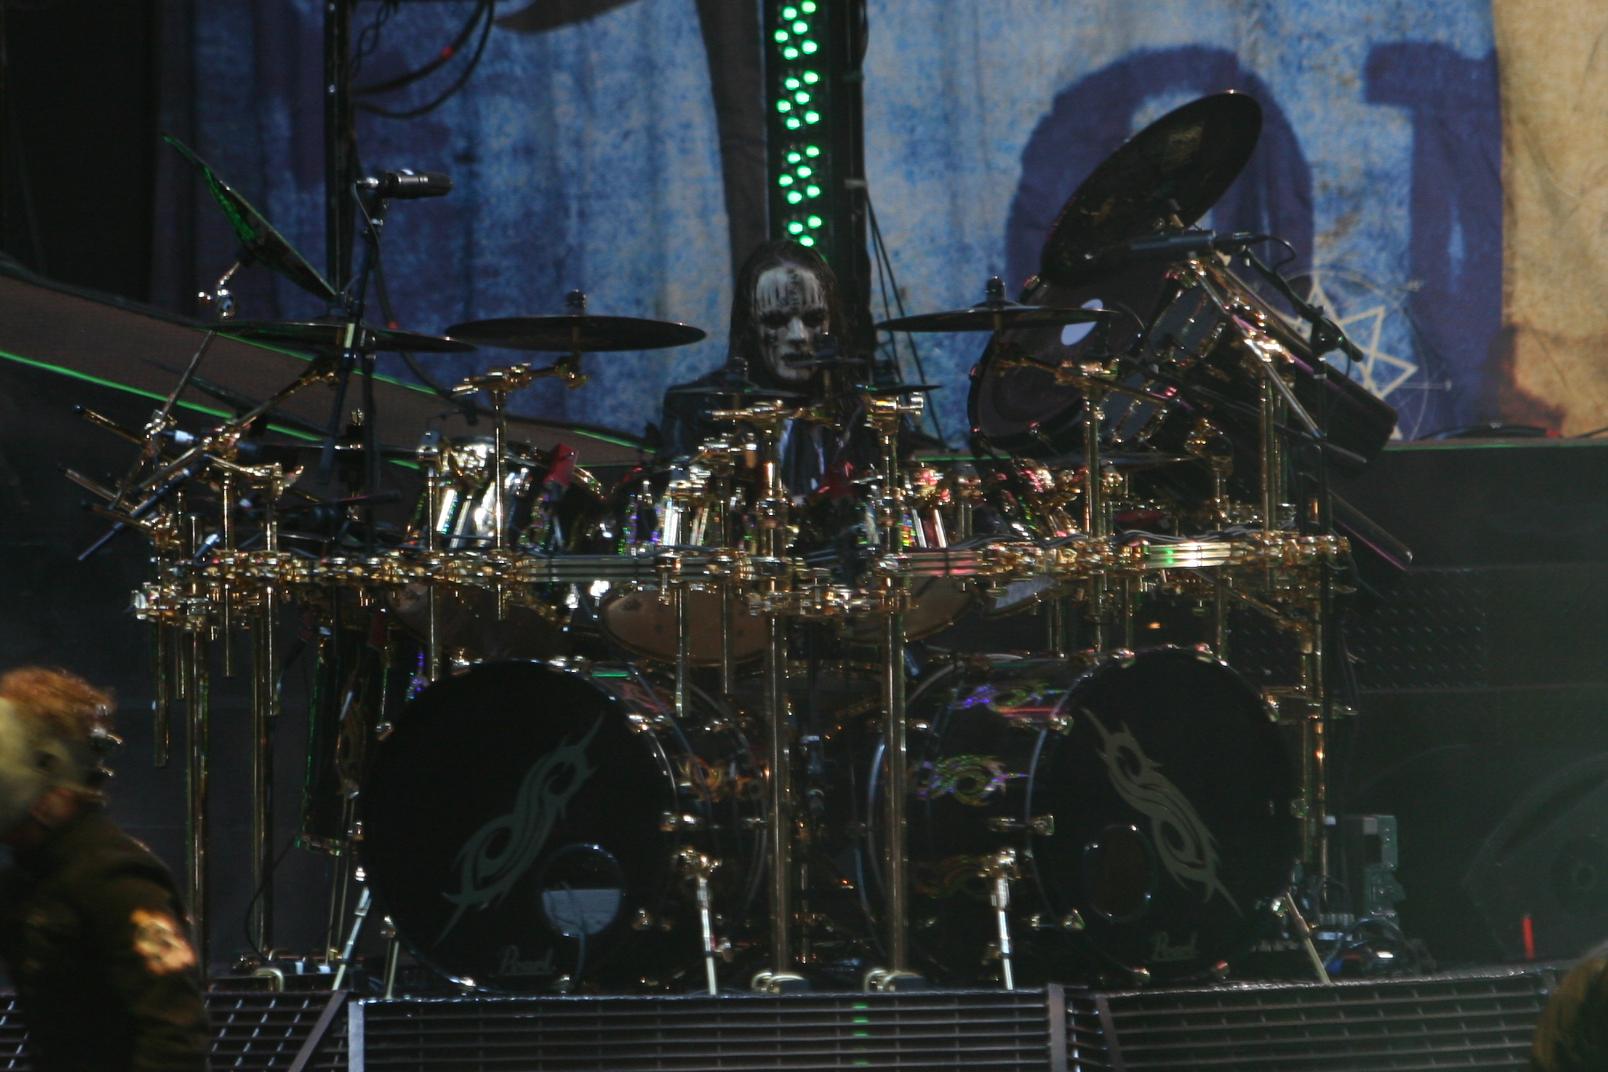 File:Joey Jordison at Mayhem.jpg - Wikipedia